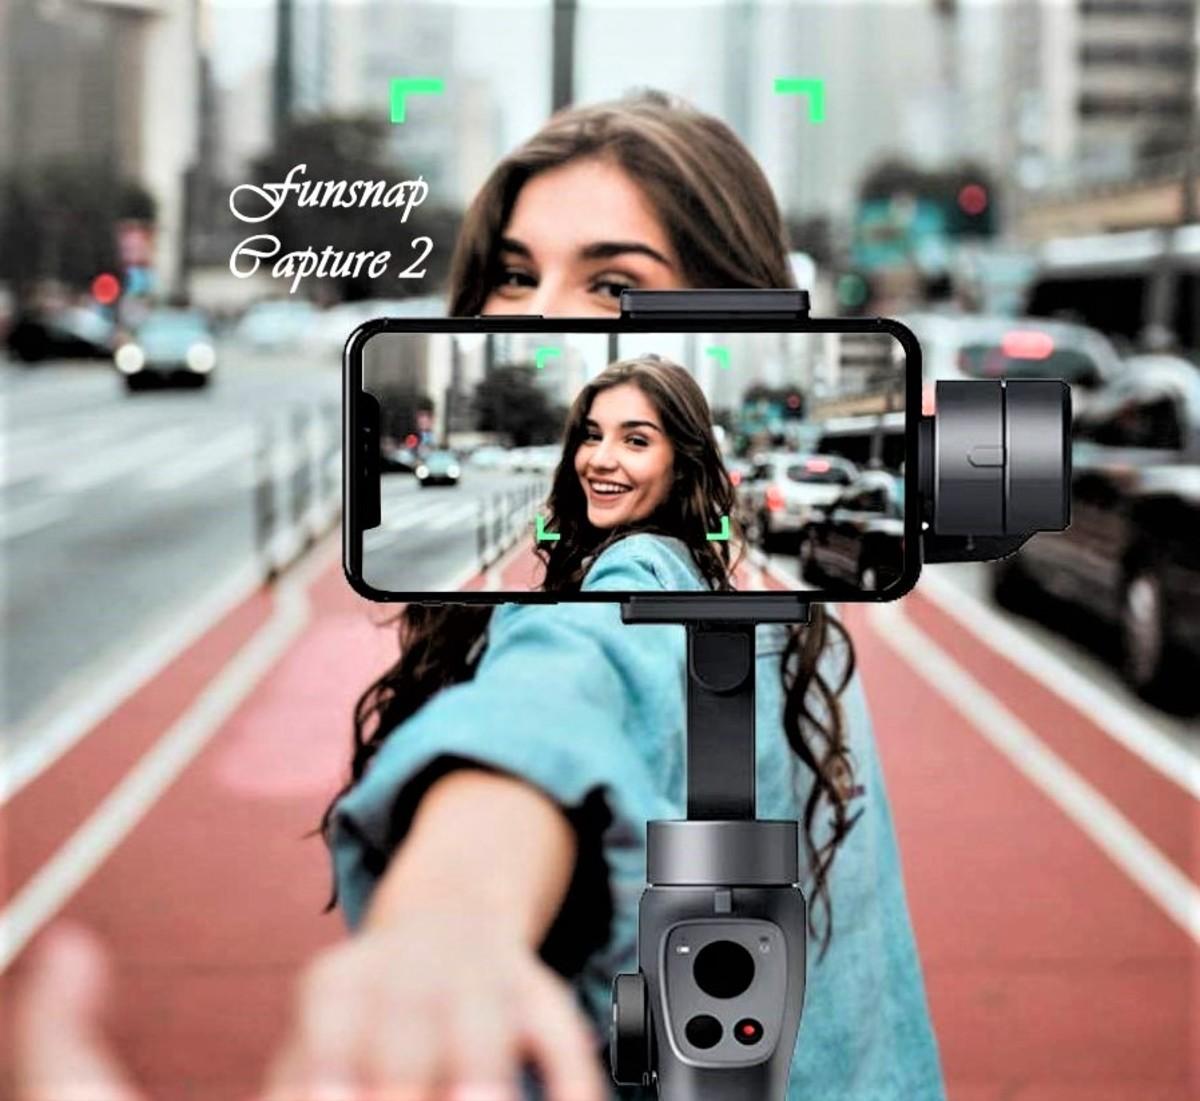 Funsnap Capture 2 Handheld Smartphone Stabilizer Gimbal